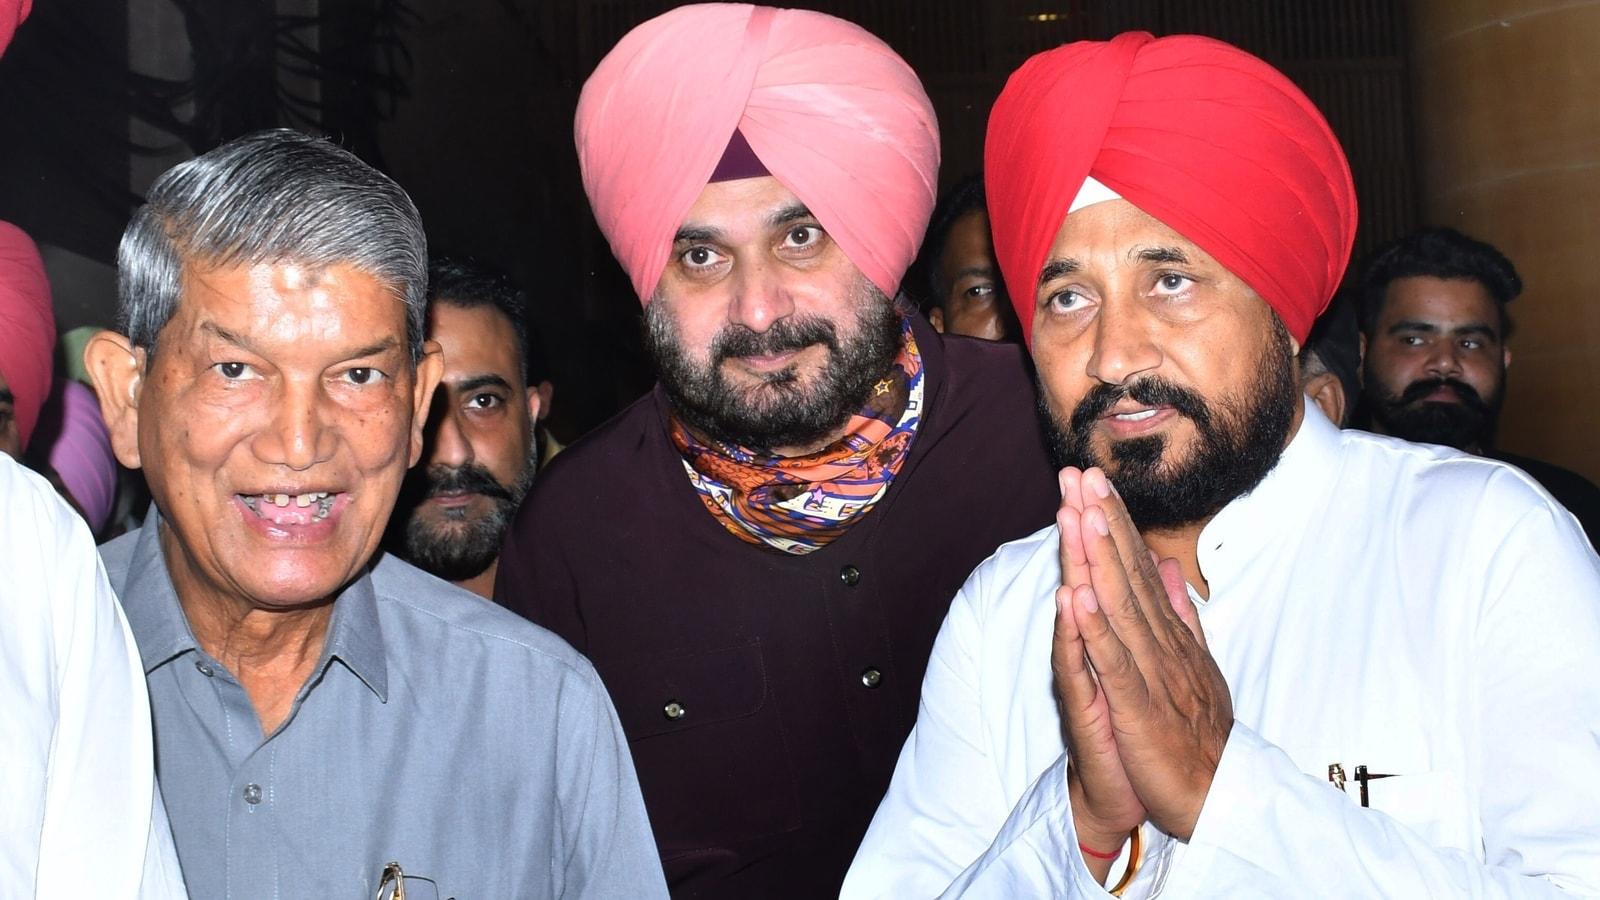 Well done, Rahul': BJP's 'Me Too' swipe over Charanjit Singh Channi | Latest News India - Hindustan Times